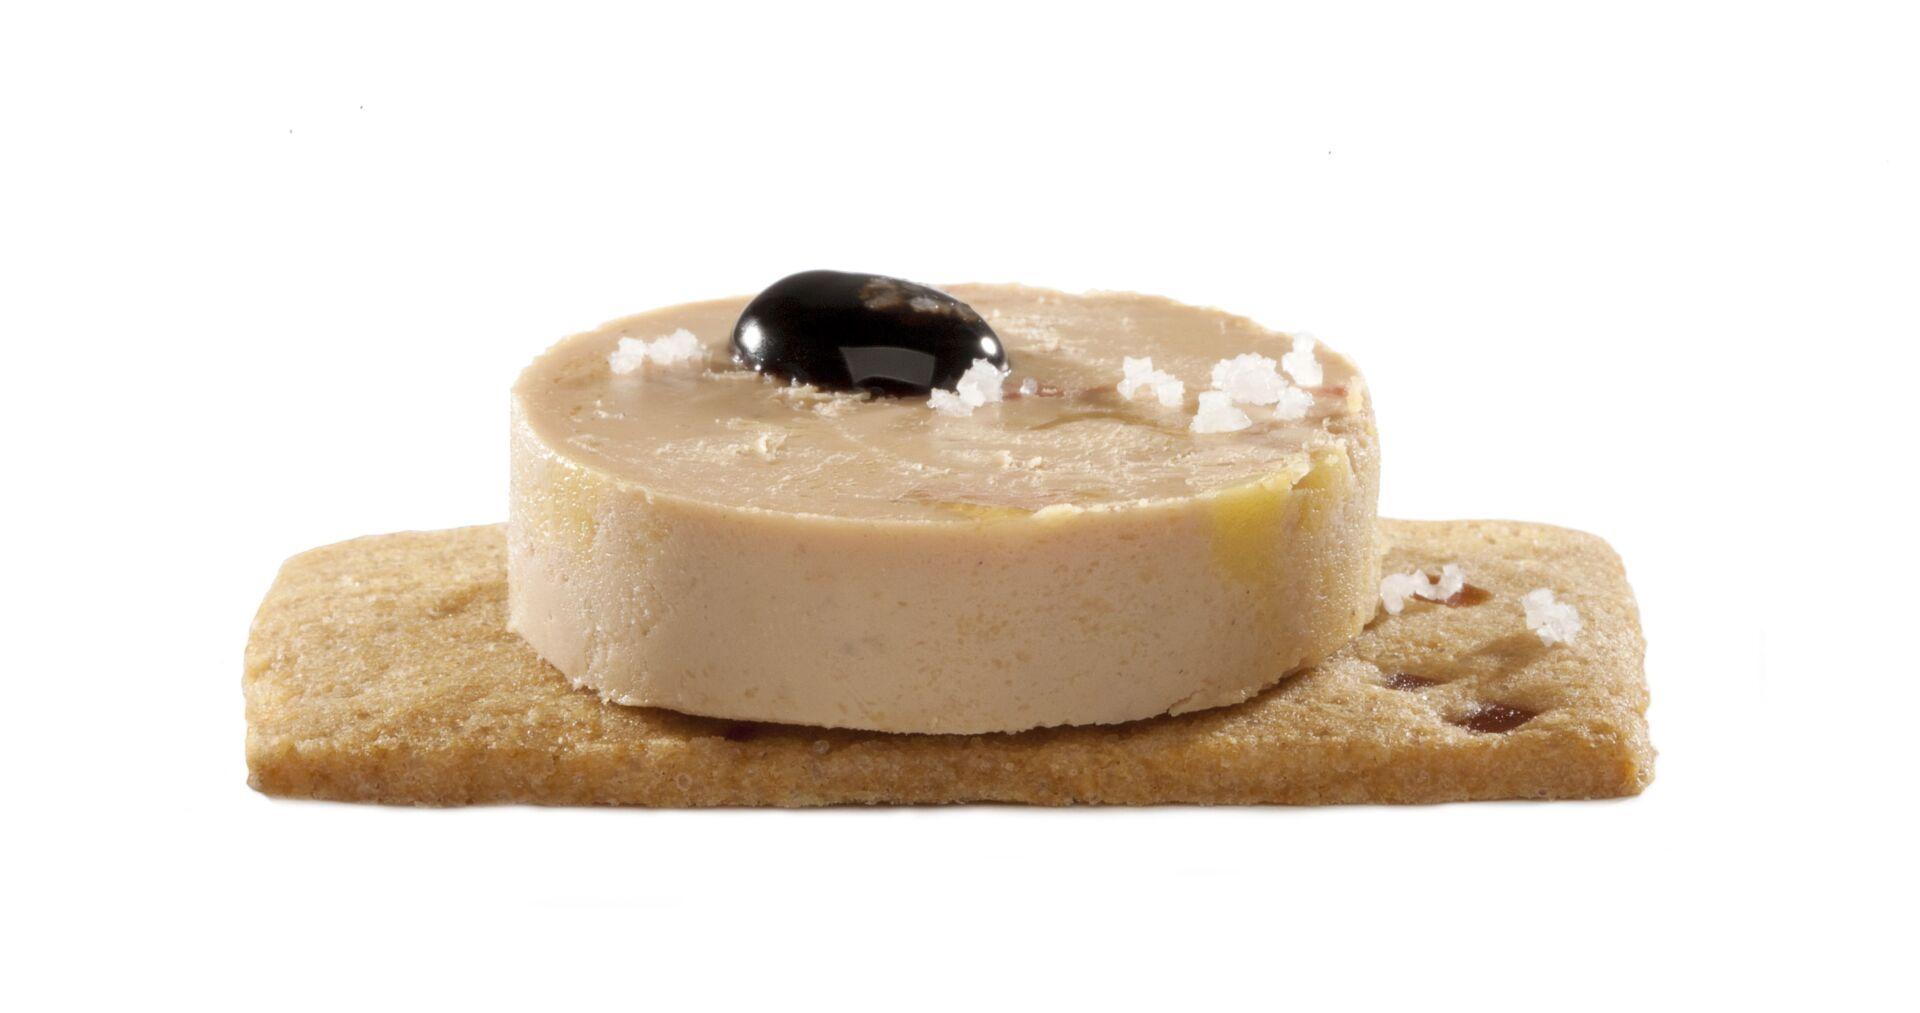 Appelkoekje foie gras